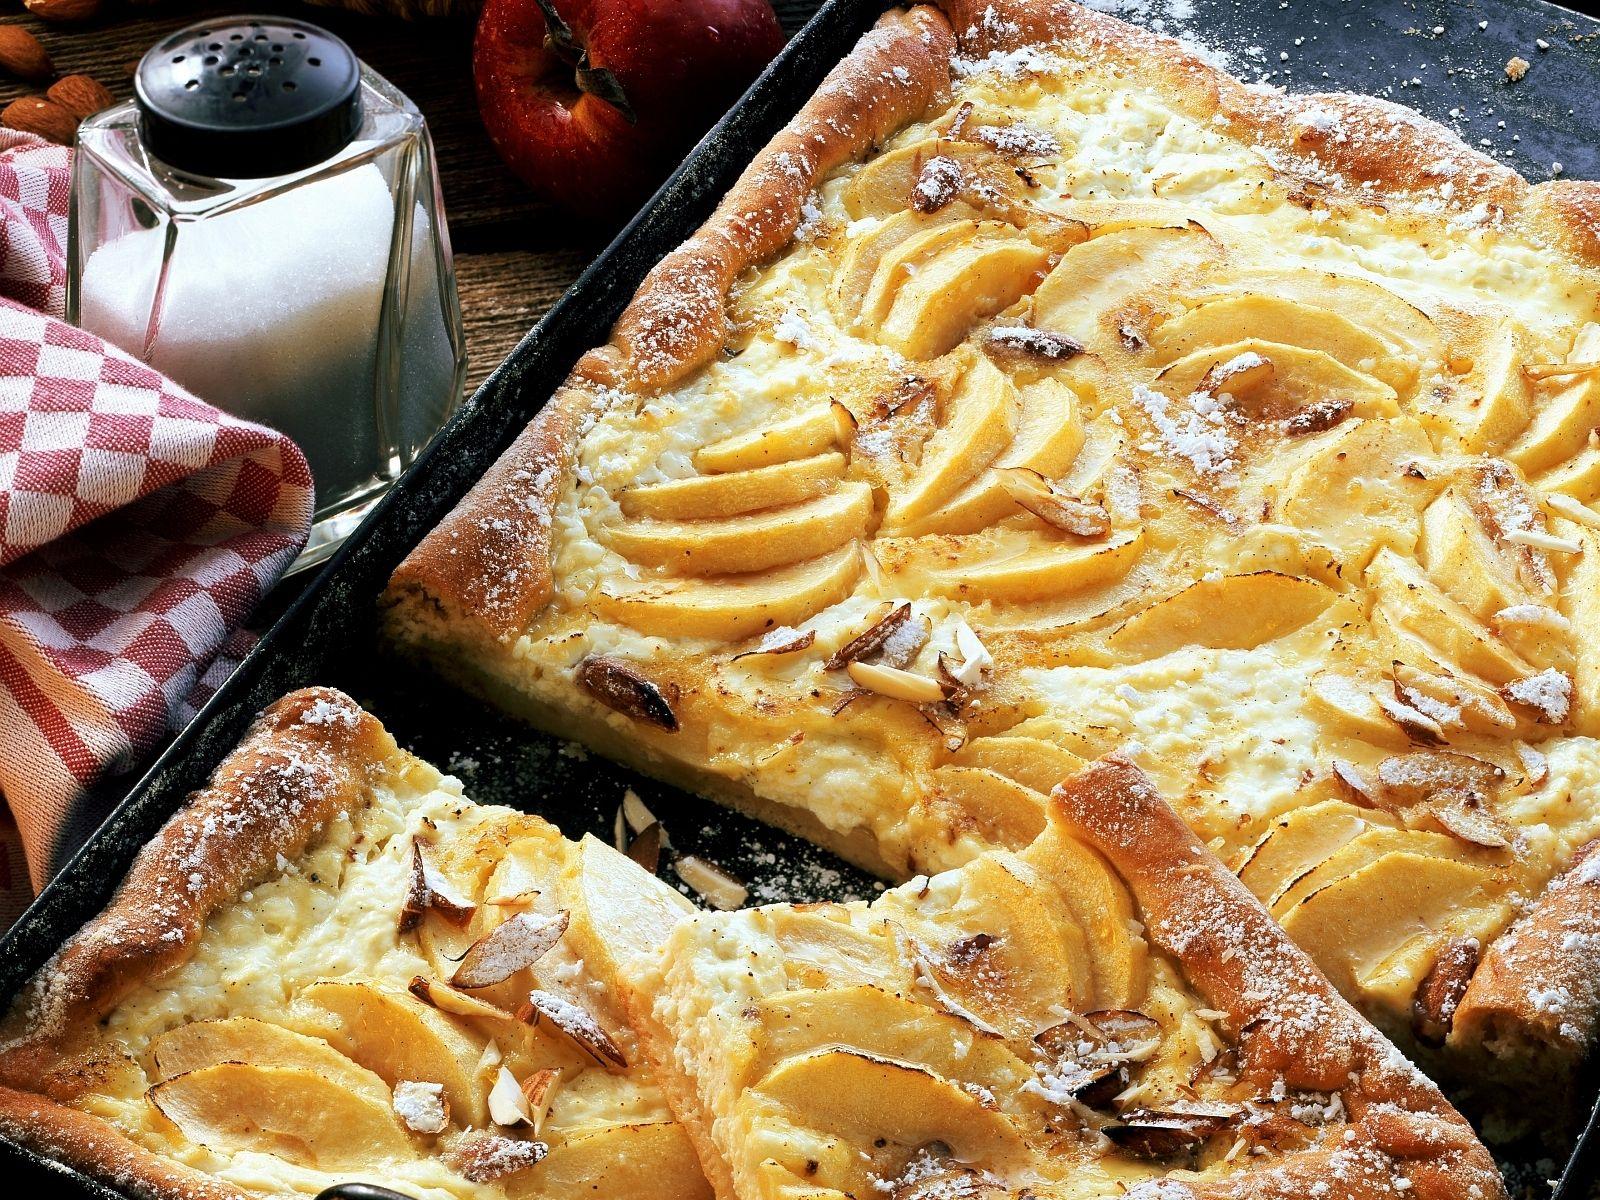 apfel-käse-kuchen nach fränkischer art rezept | eat smarter - Fränkische Küche Rezepte